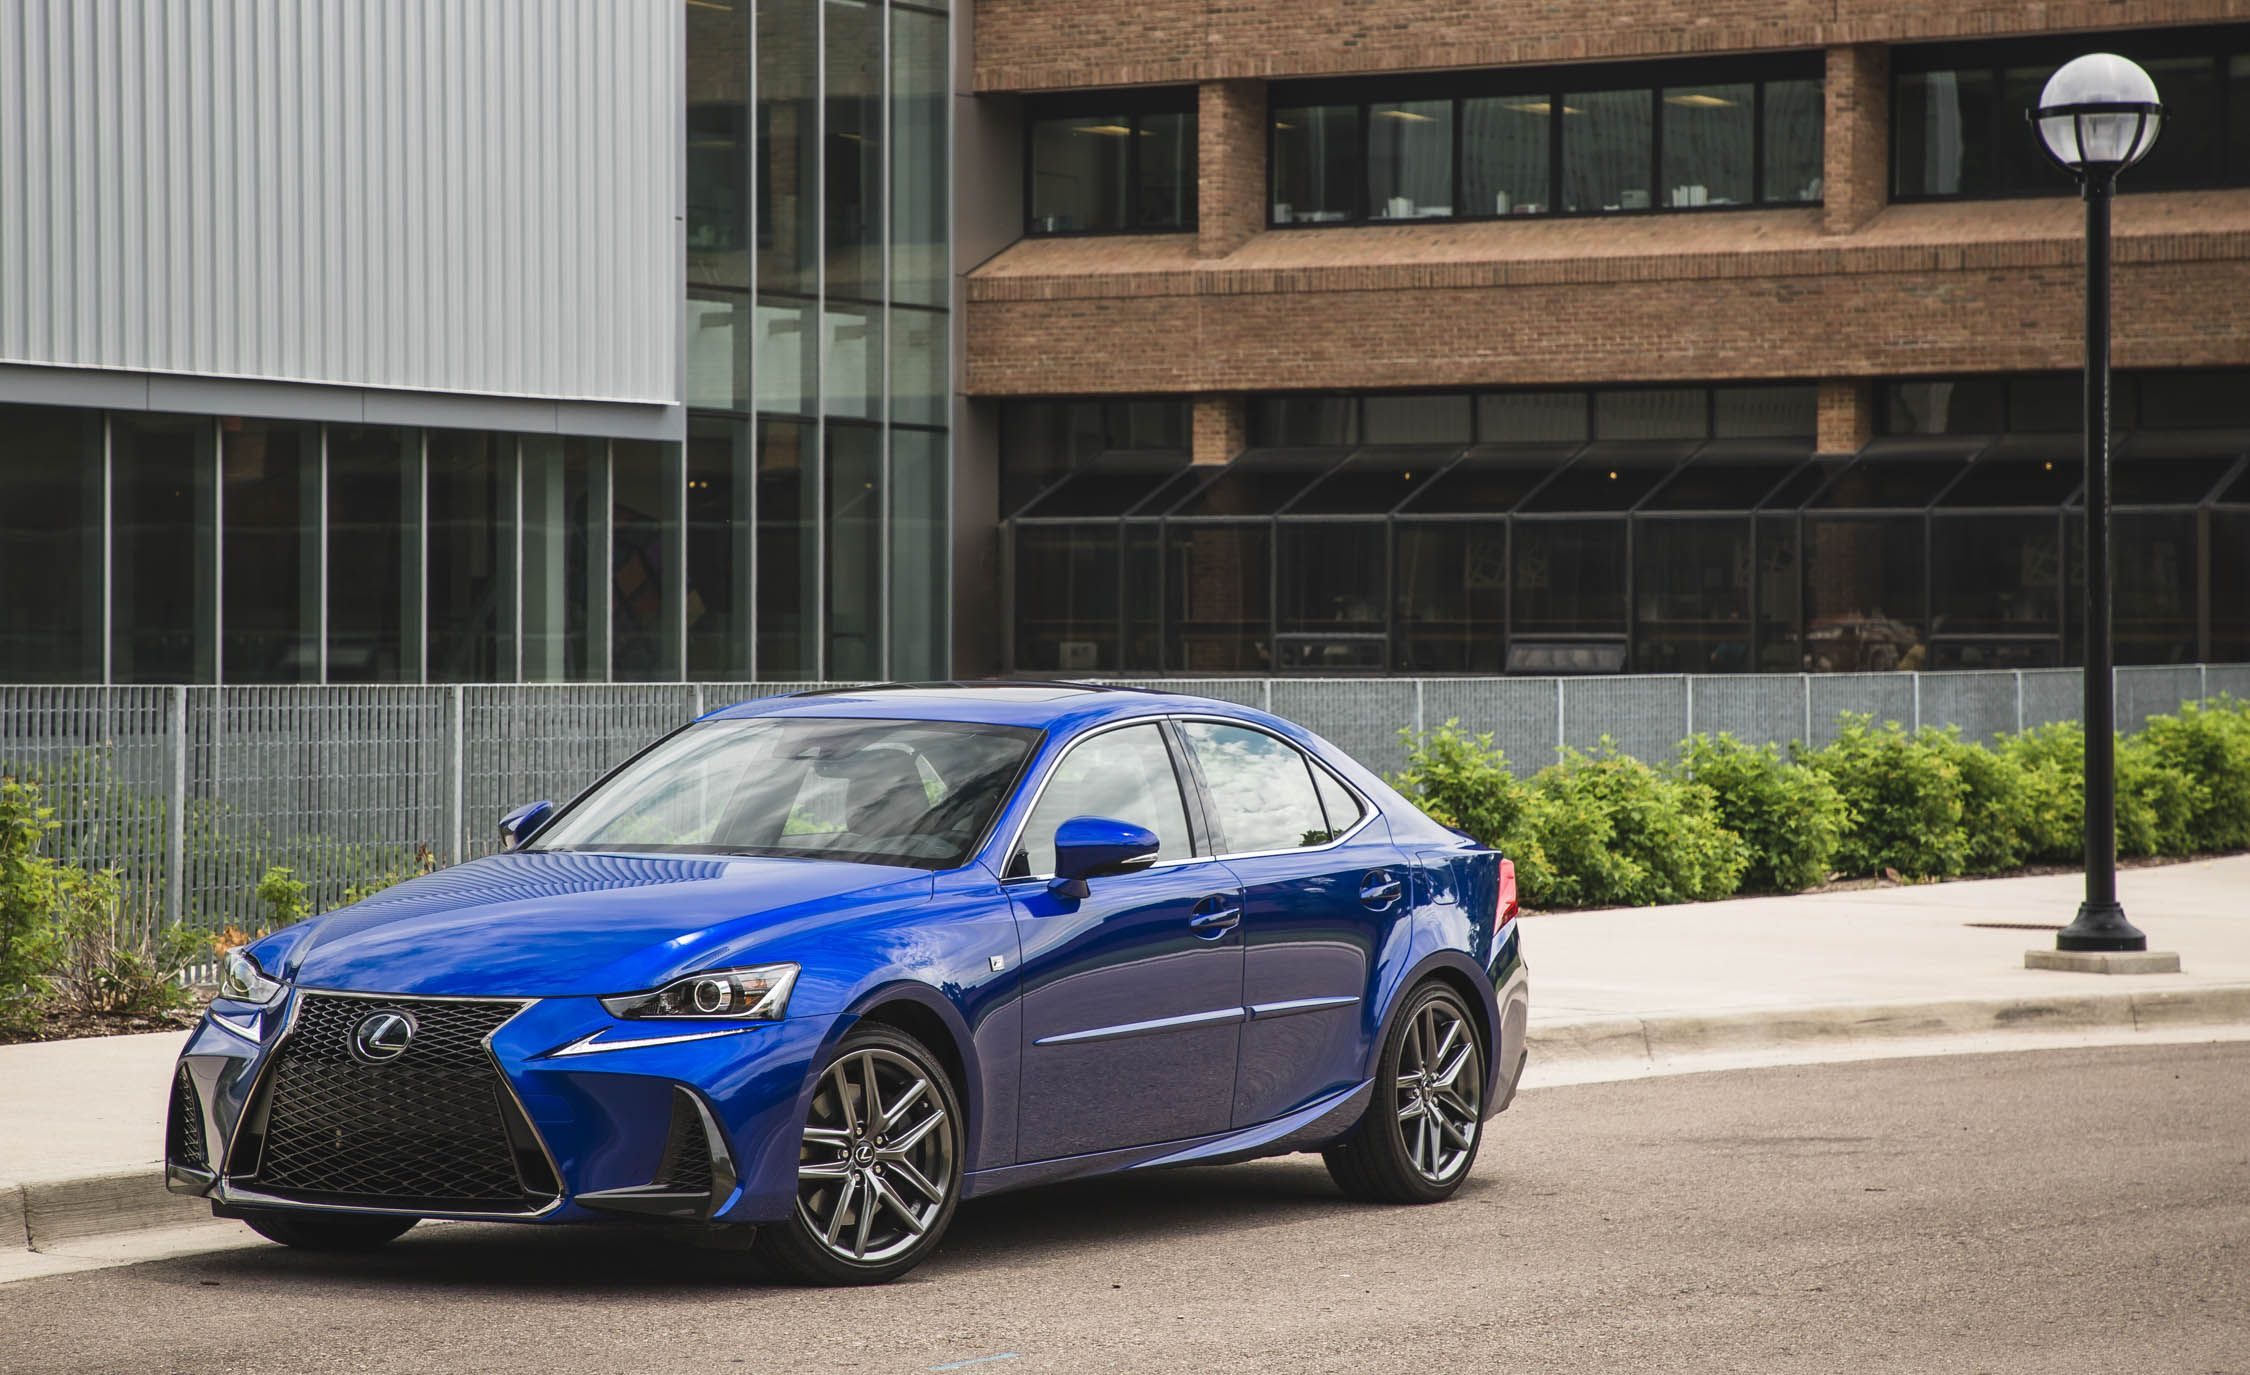 Lexus IS Reviews Lexus IS Price s and Specs